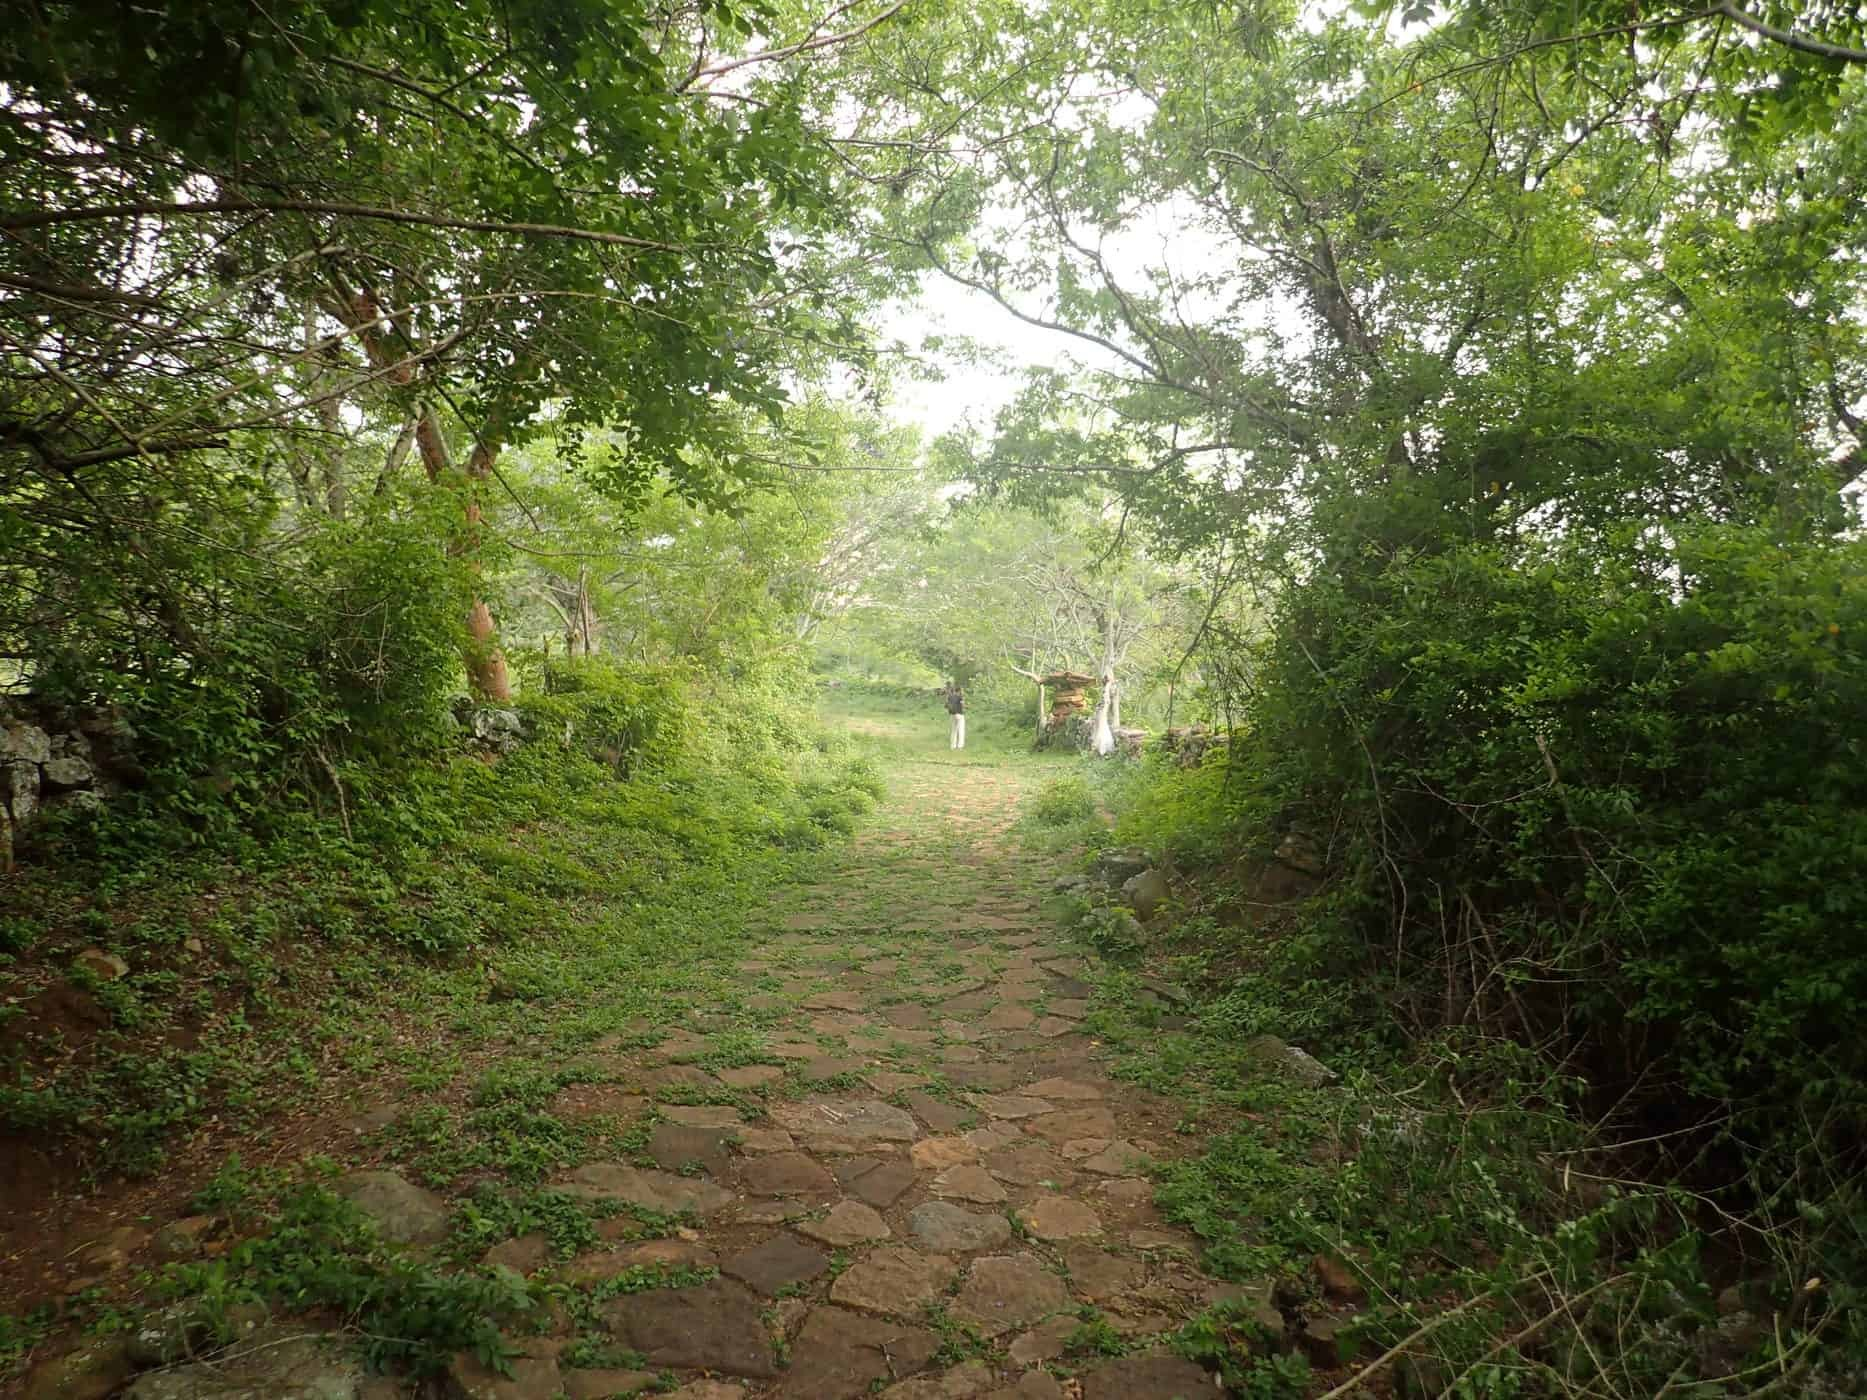 The Camino Real, Barichara, Colombia.